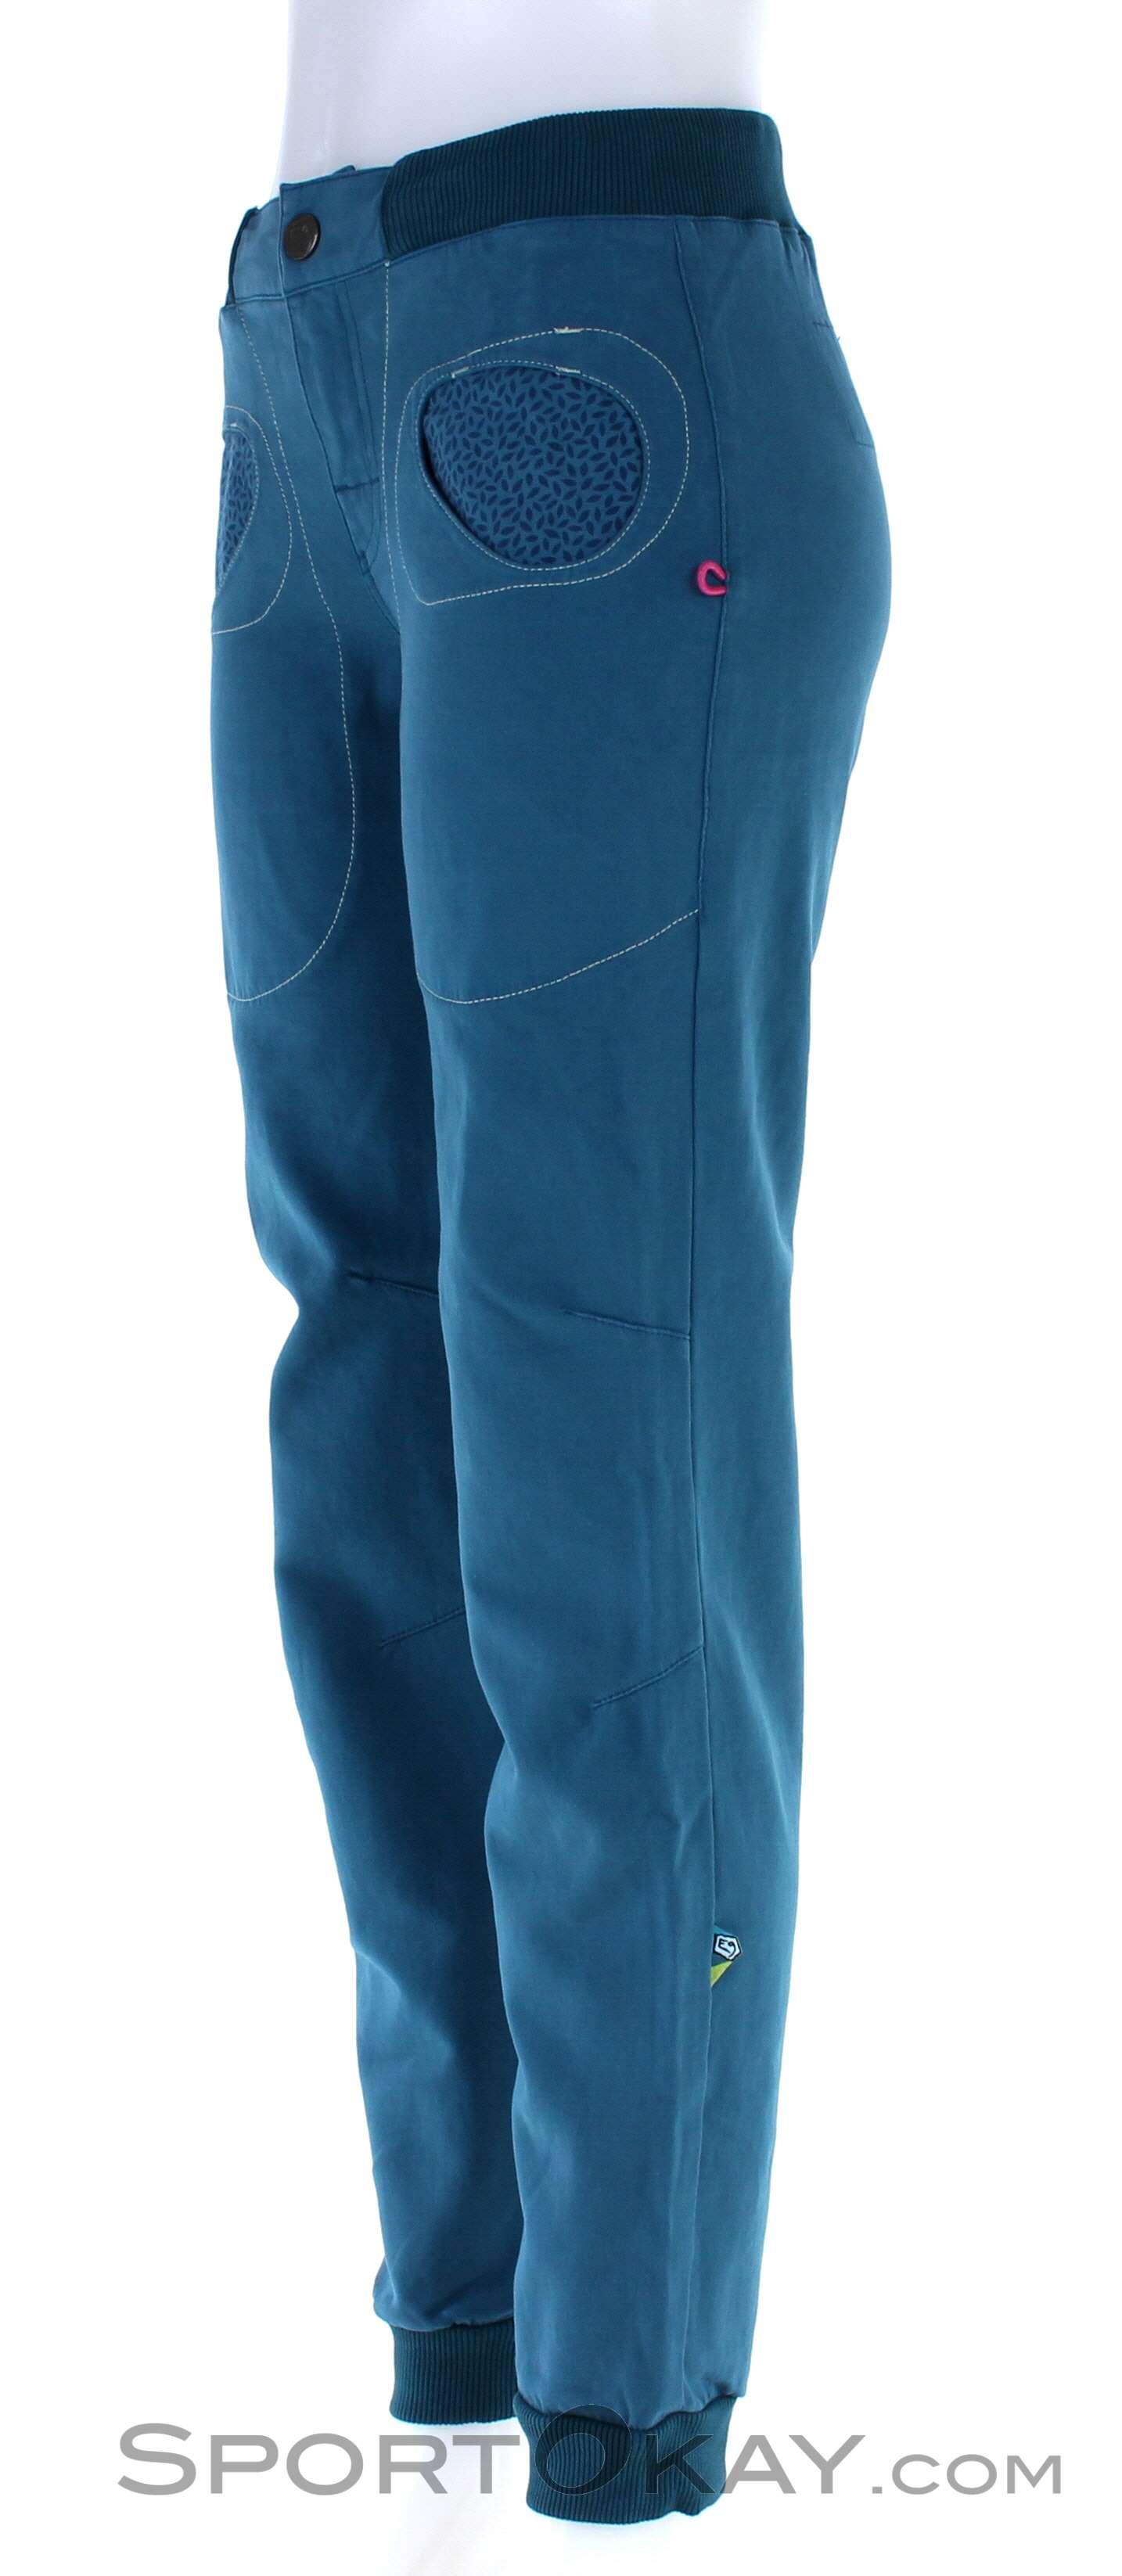 E9 Pantaloni Slim Ondart Donna Pantaloni da Arrampicata